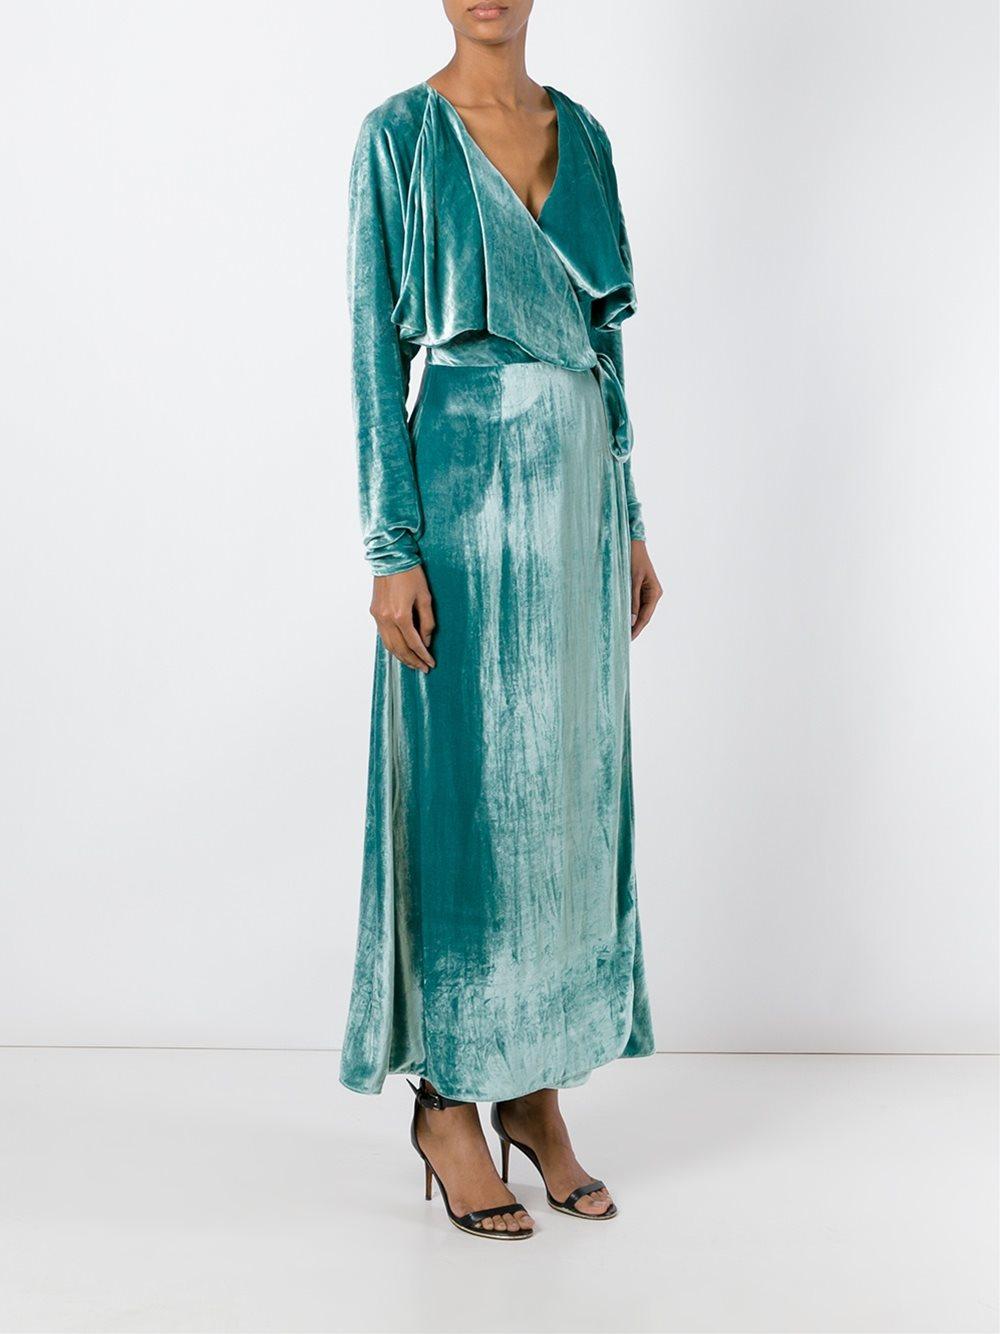 Long sleeved wrap dress